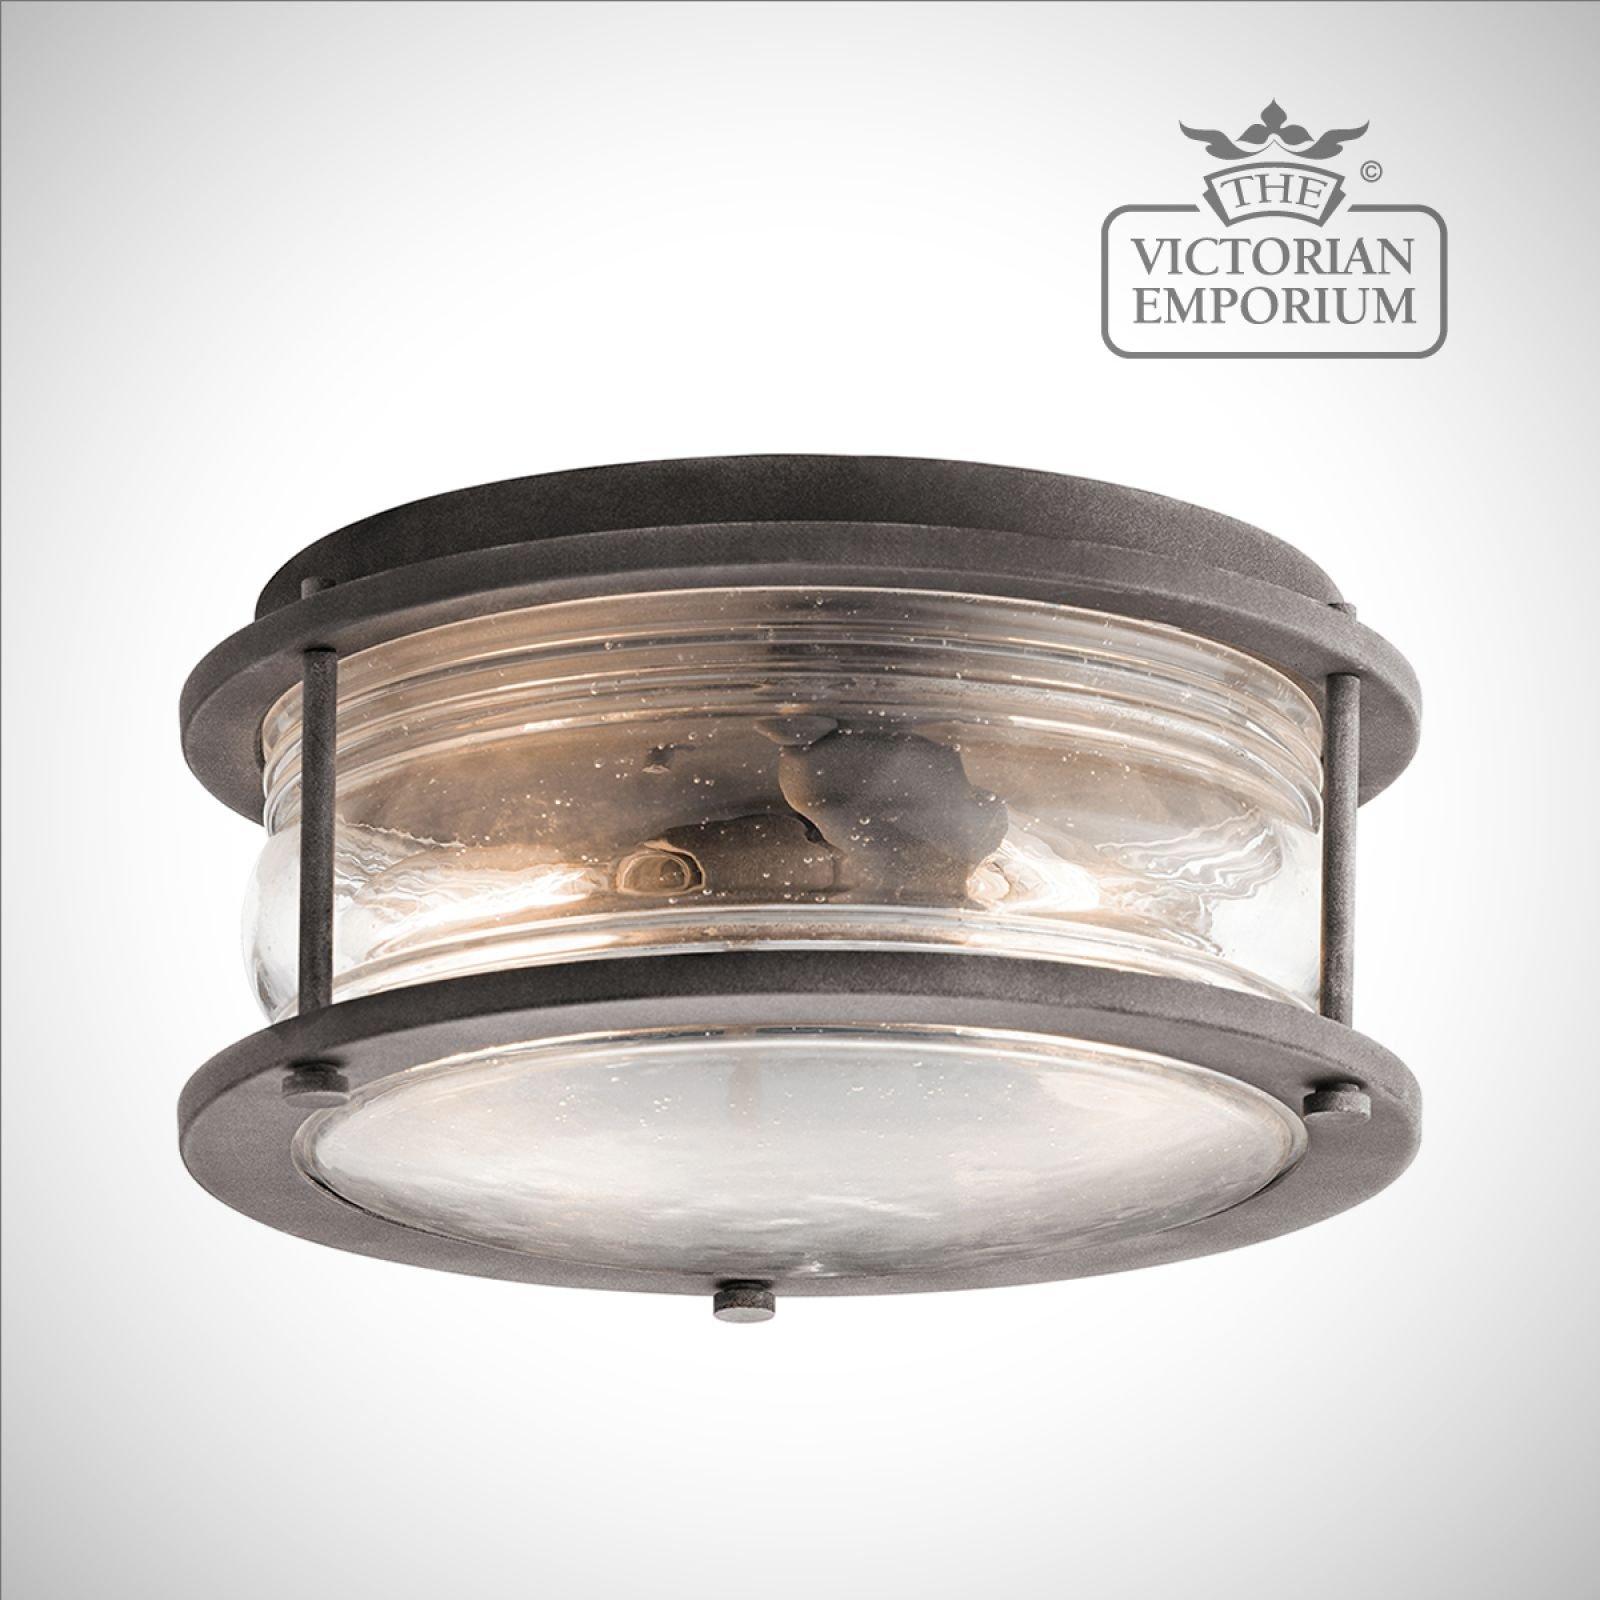 Ashland Flush Mount Lantern In Weathered Zinc Exterior Ceiling Lights